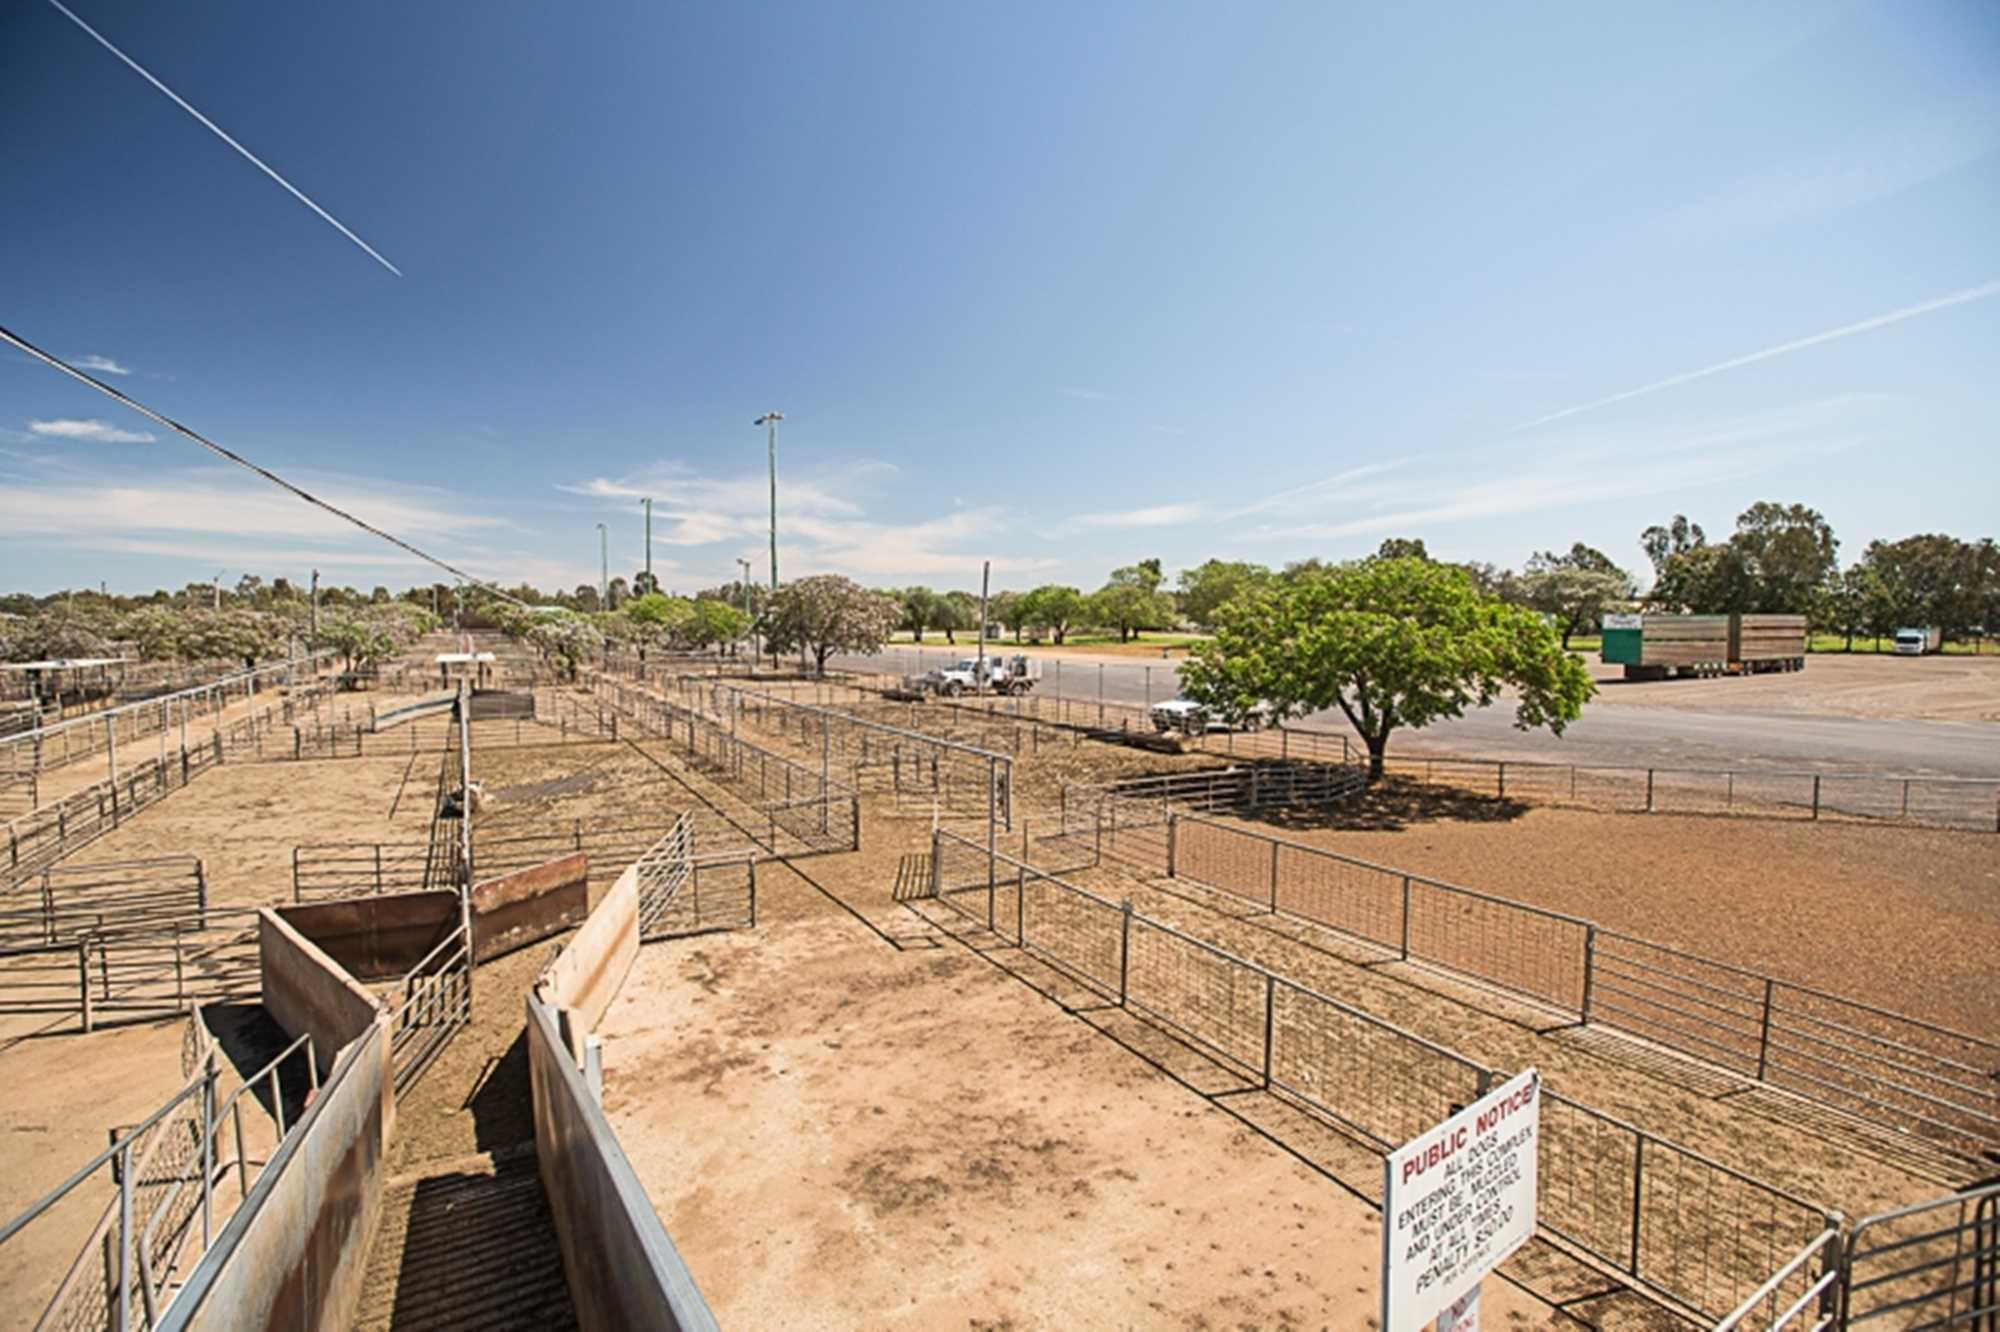 Yard Sales